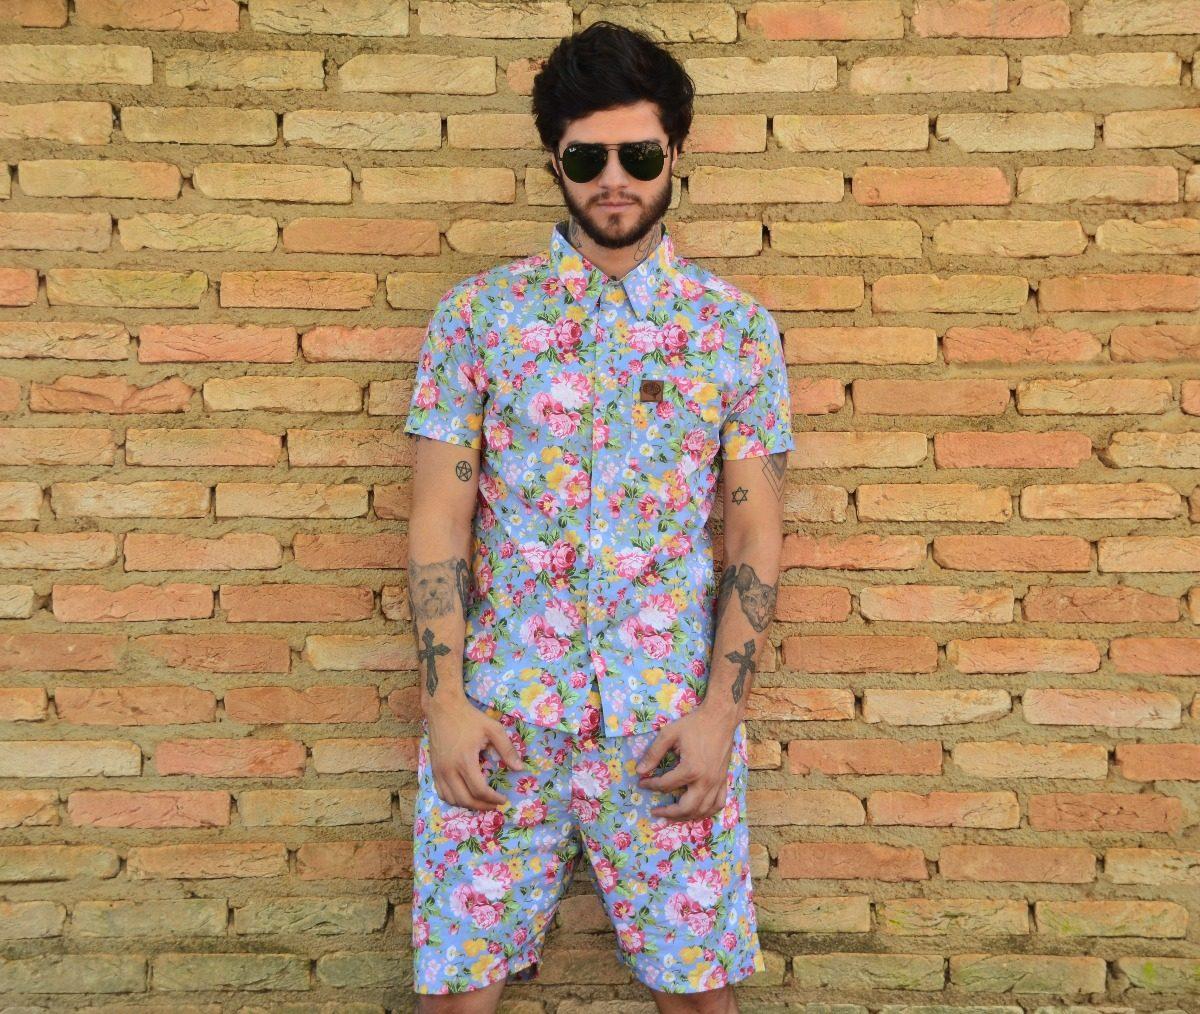 195afc544 conjunto camisa + short floral estampada camisologia. Carregando zoom.